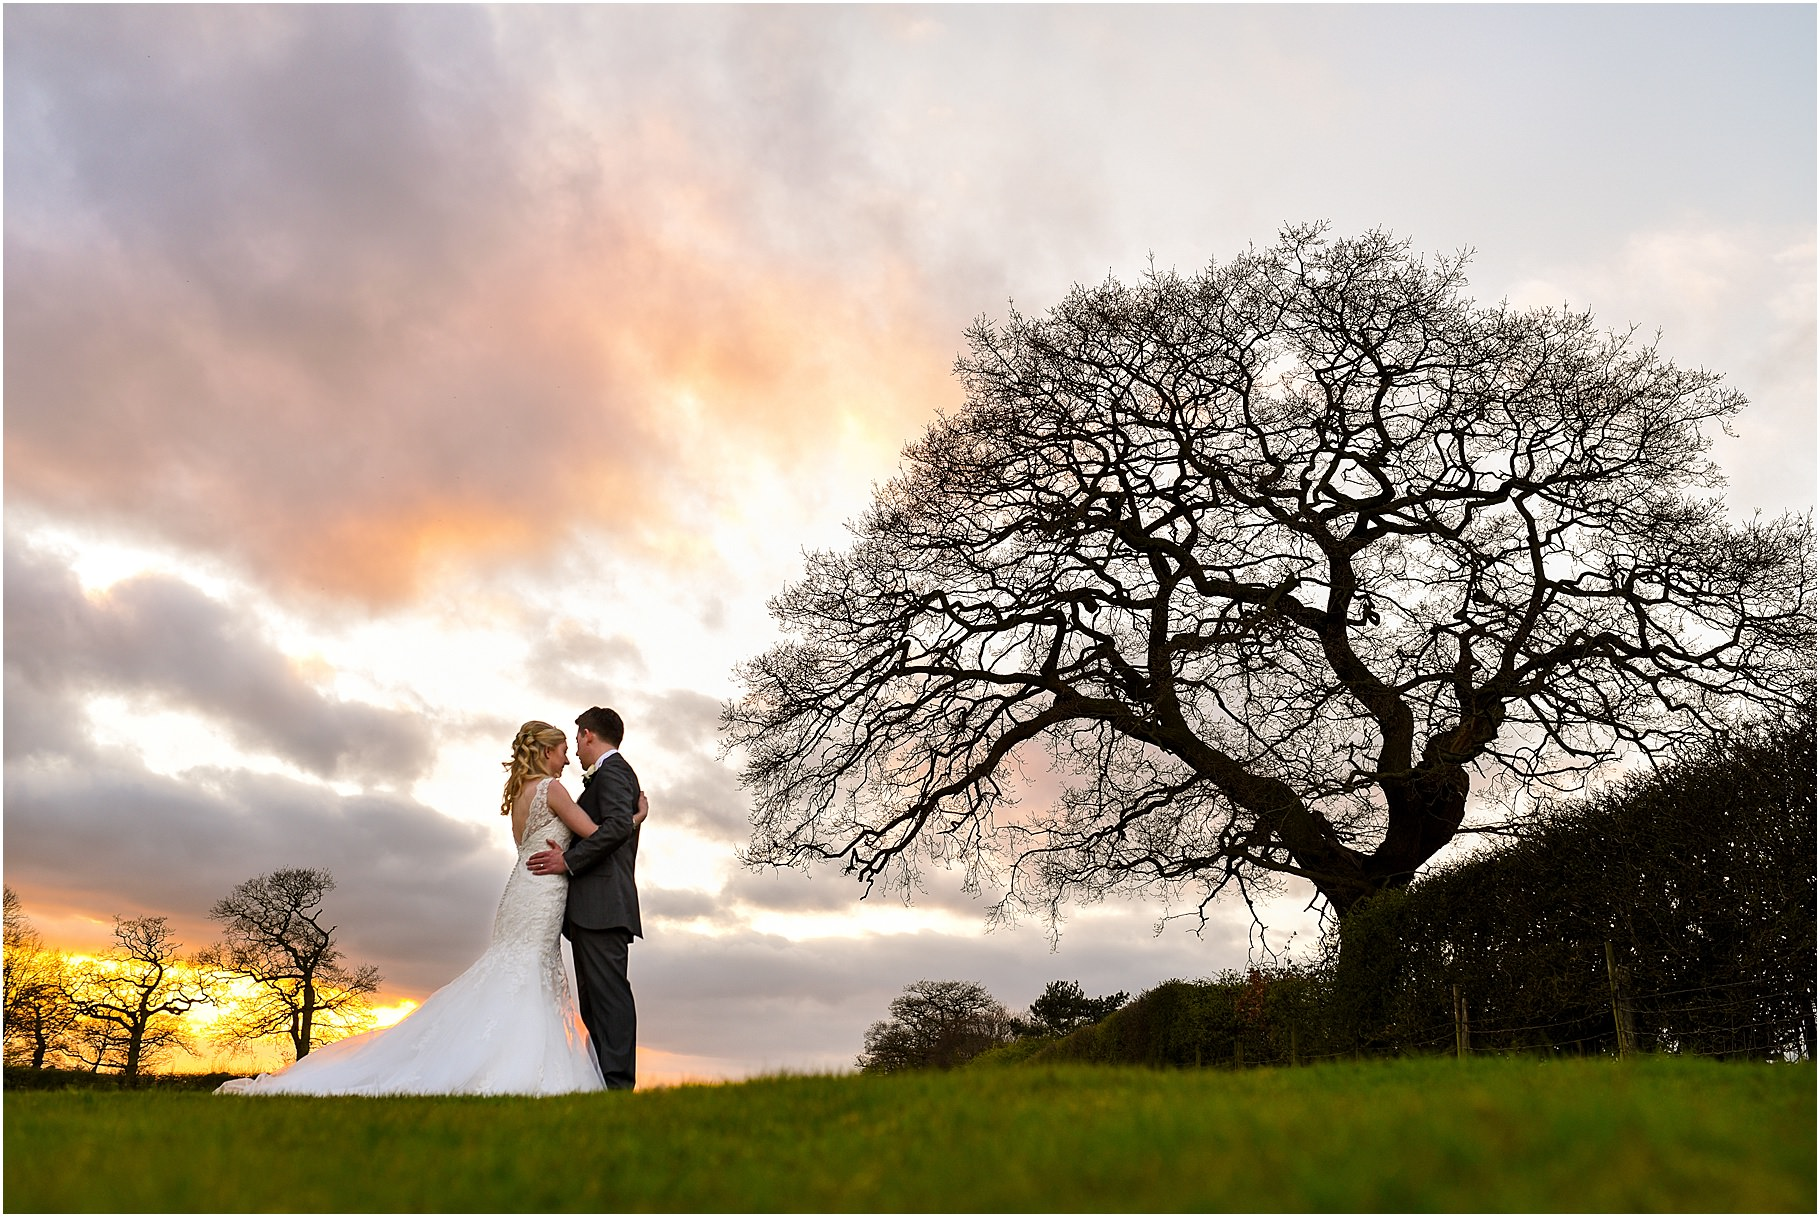 dan-wootton-photography-2017-weddings-184.jpg